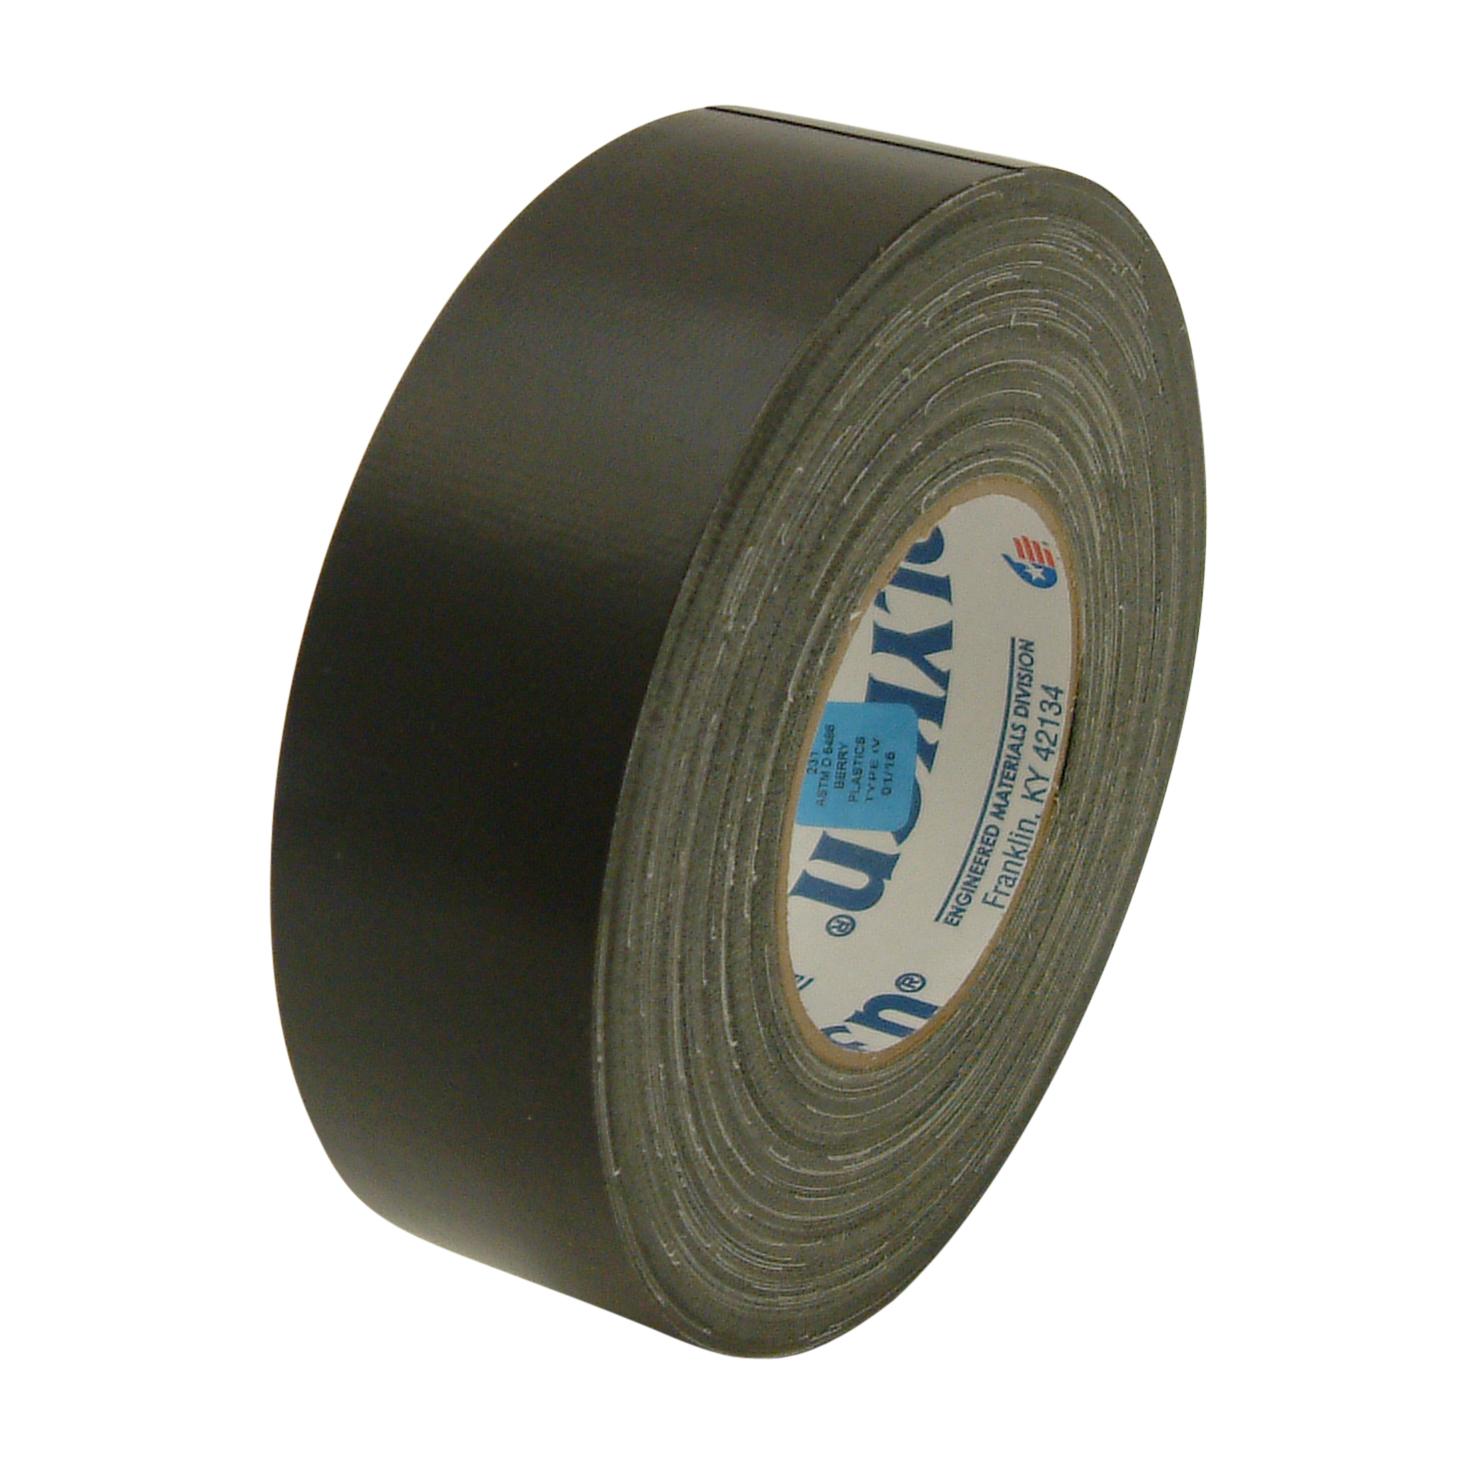 Polyken 231 Military Grade Duct Tape: 2 in. x 60 yds. (Black) *branded